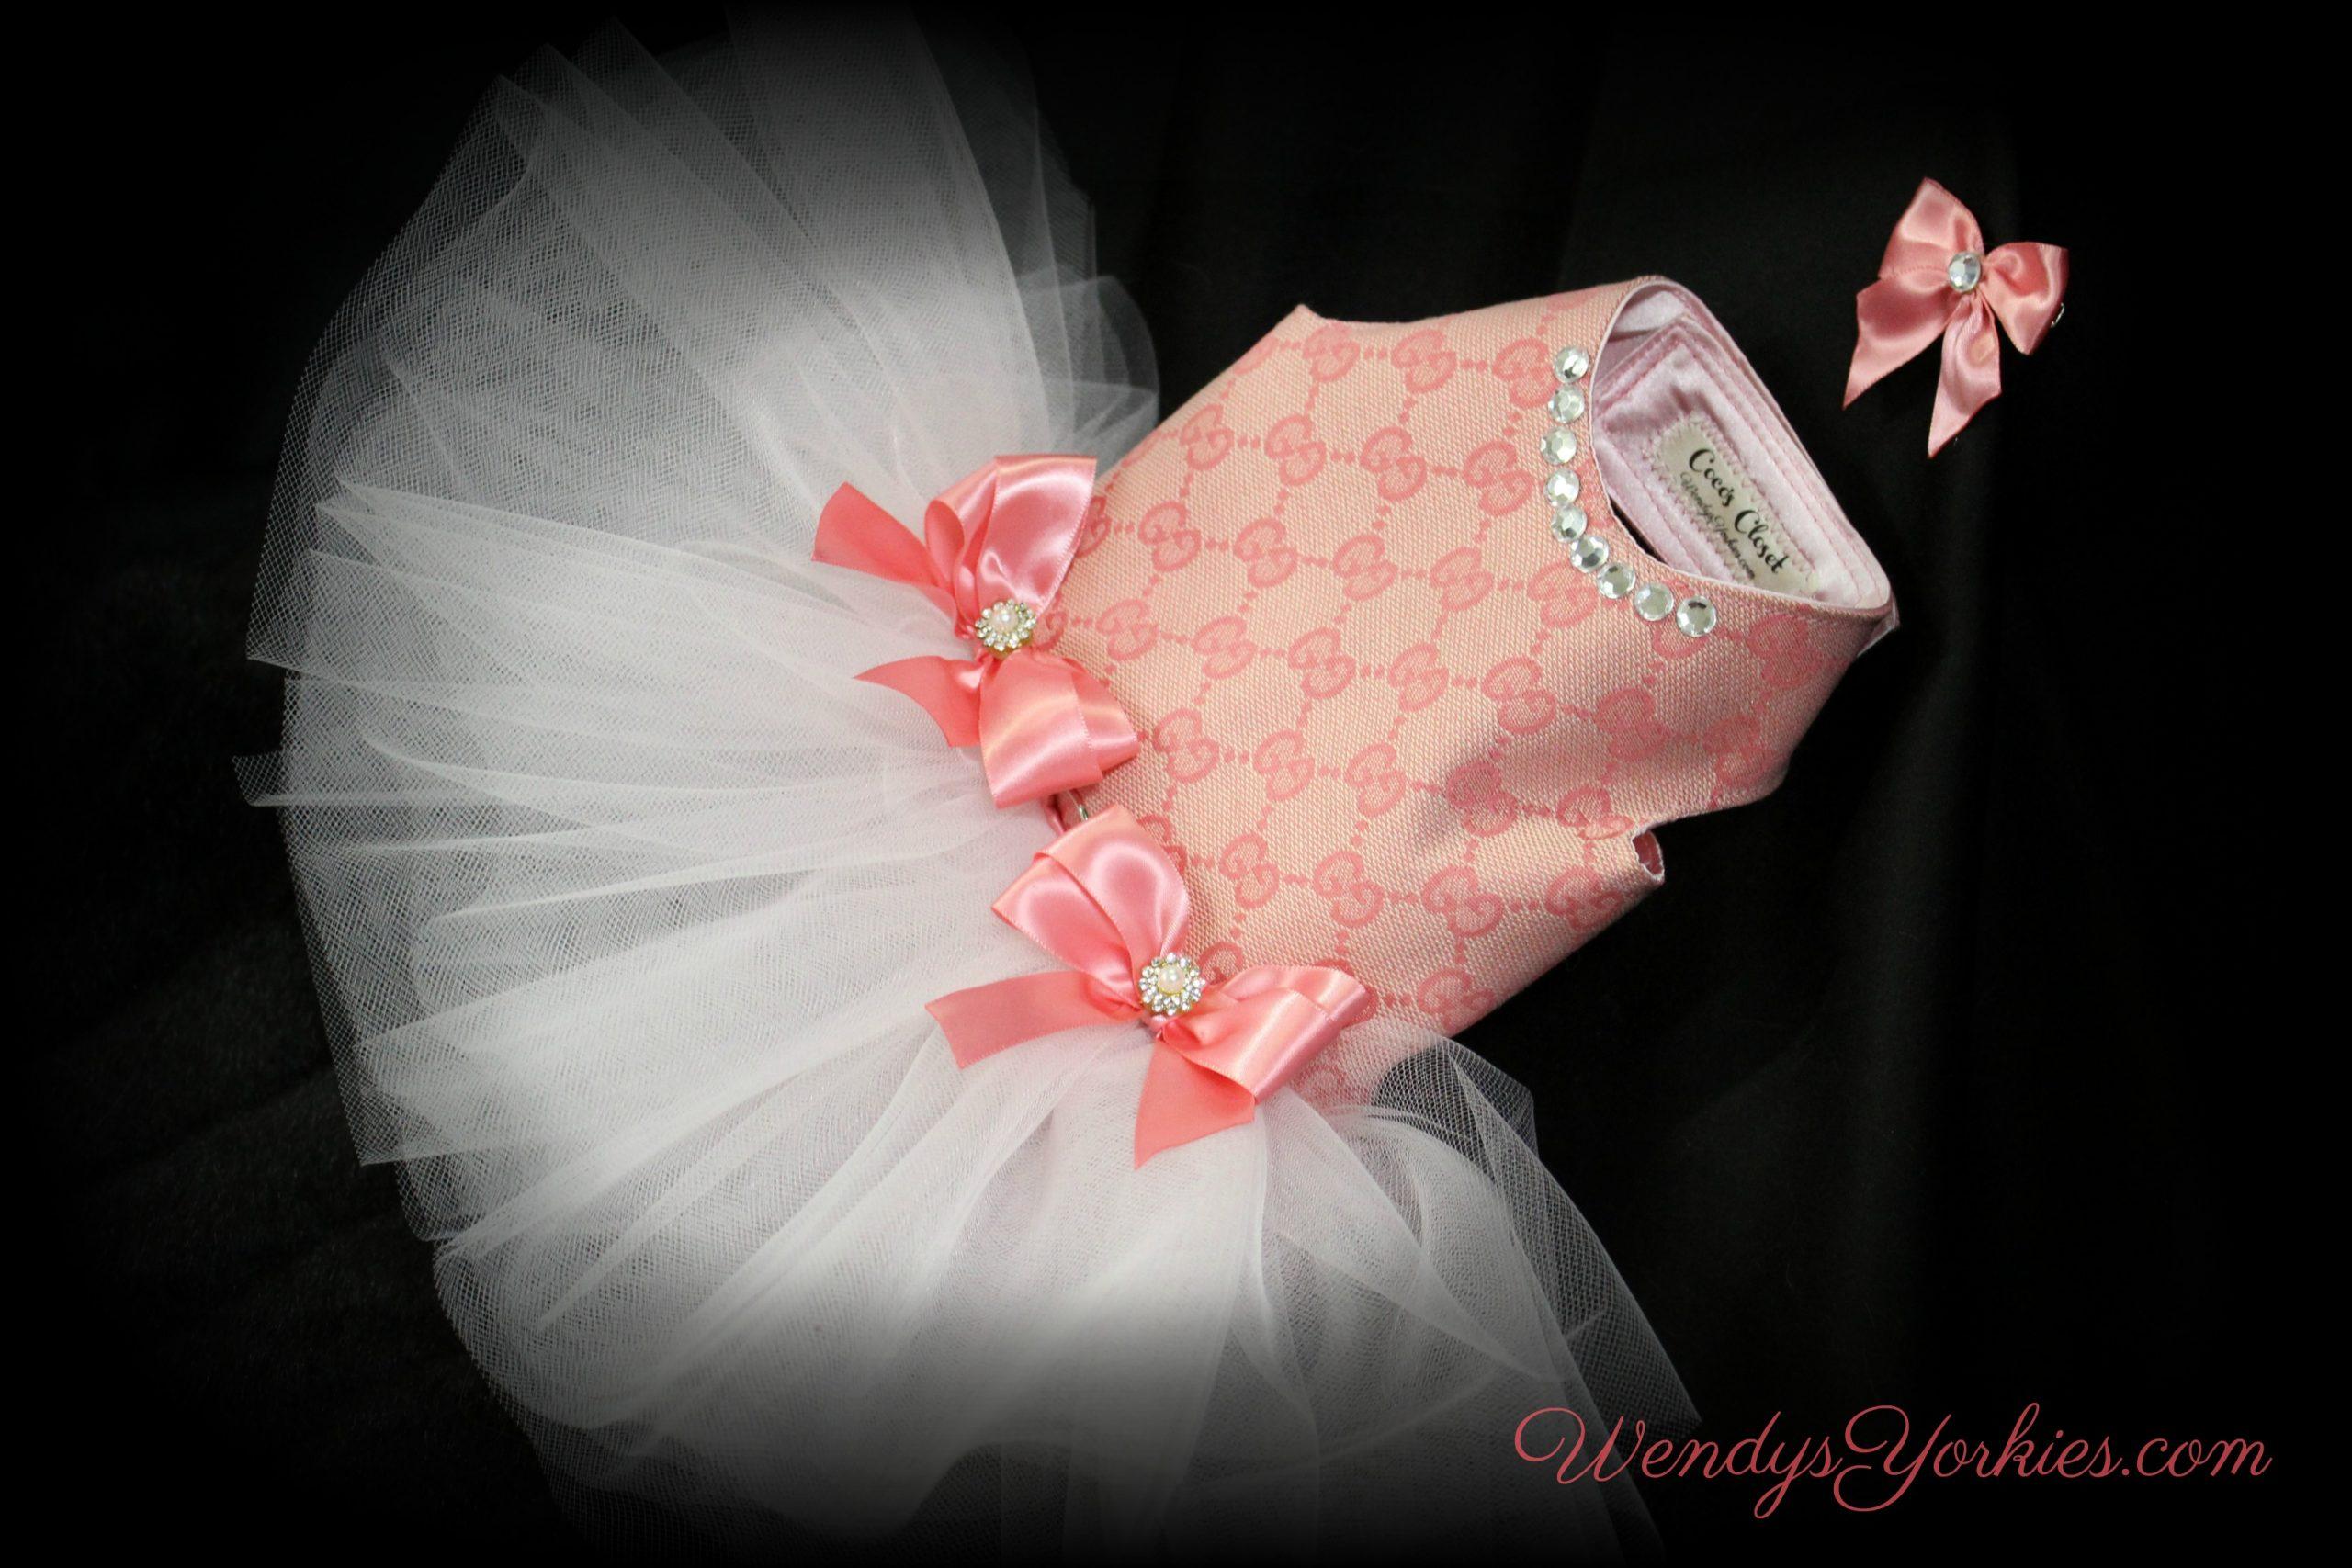 Pink GG Dog Tutu, Coco's Closet, WendysYorkies.com